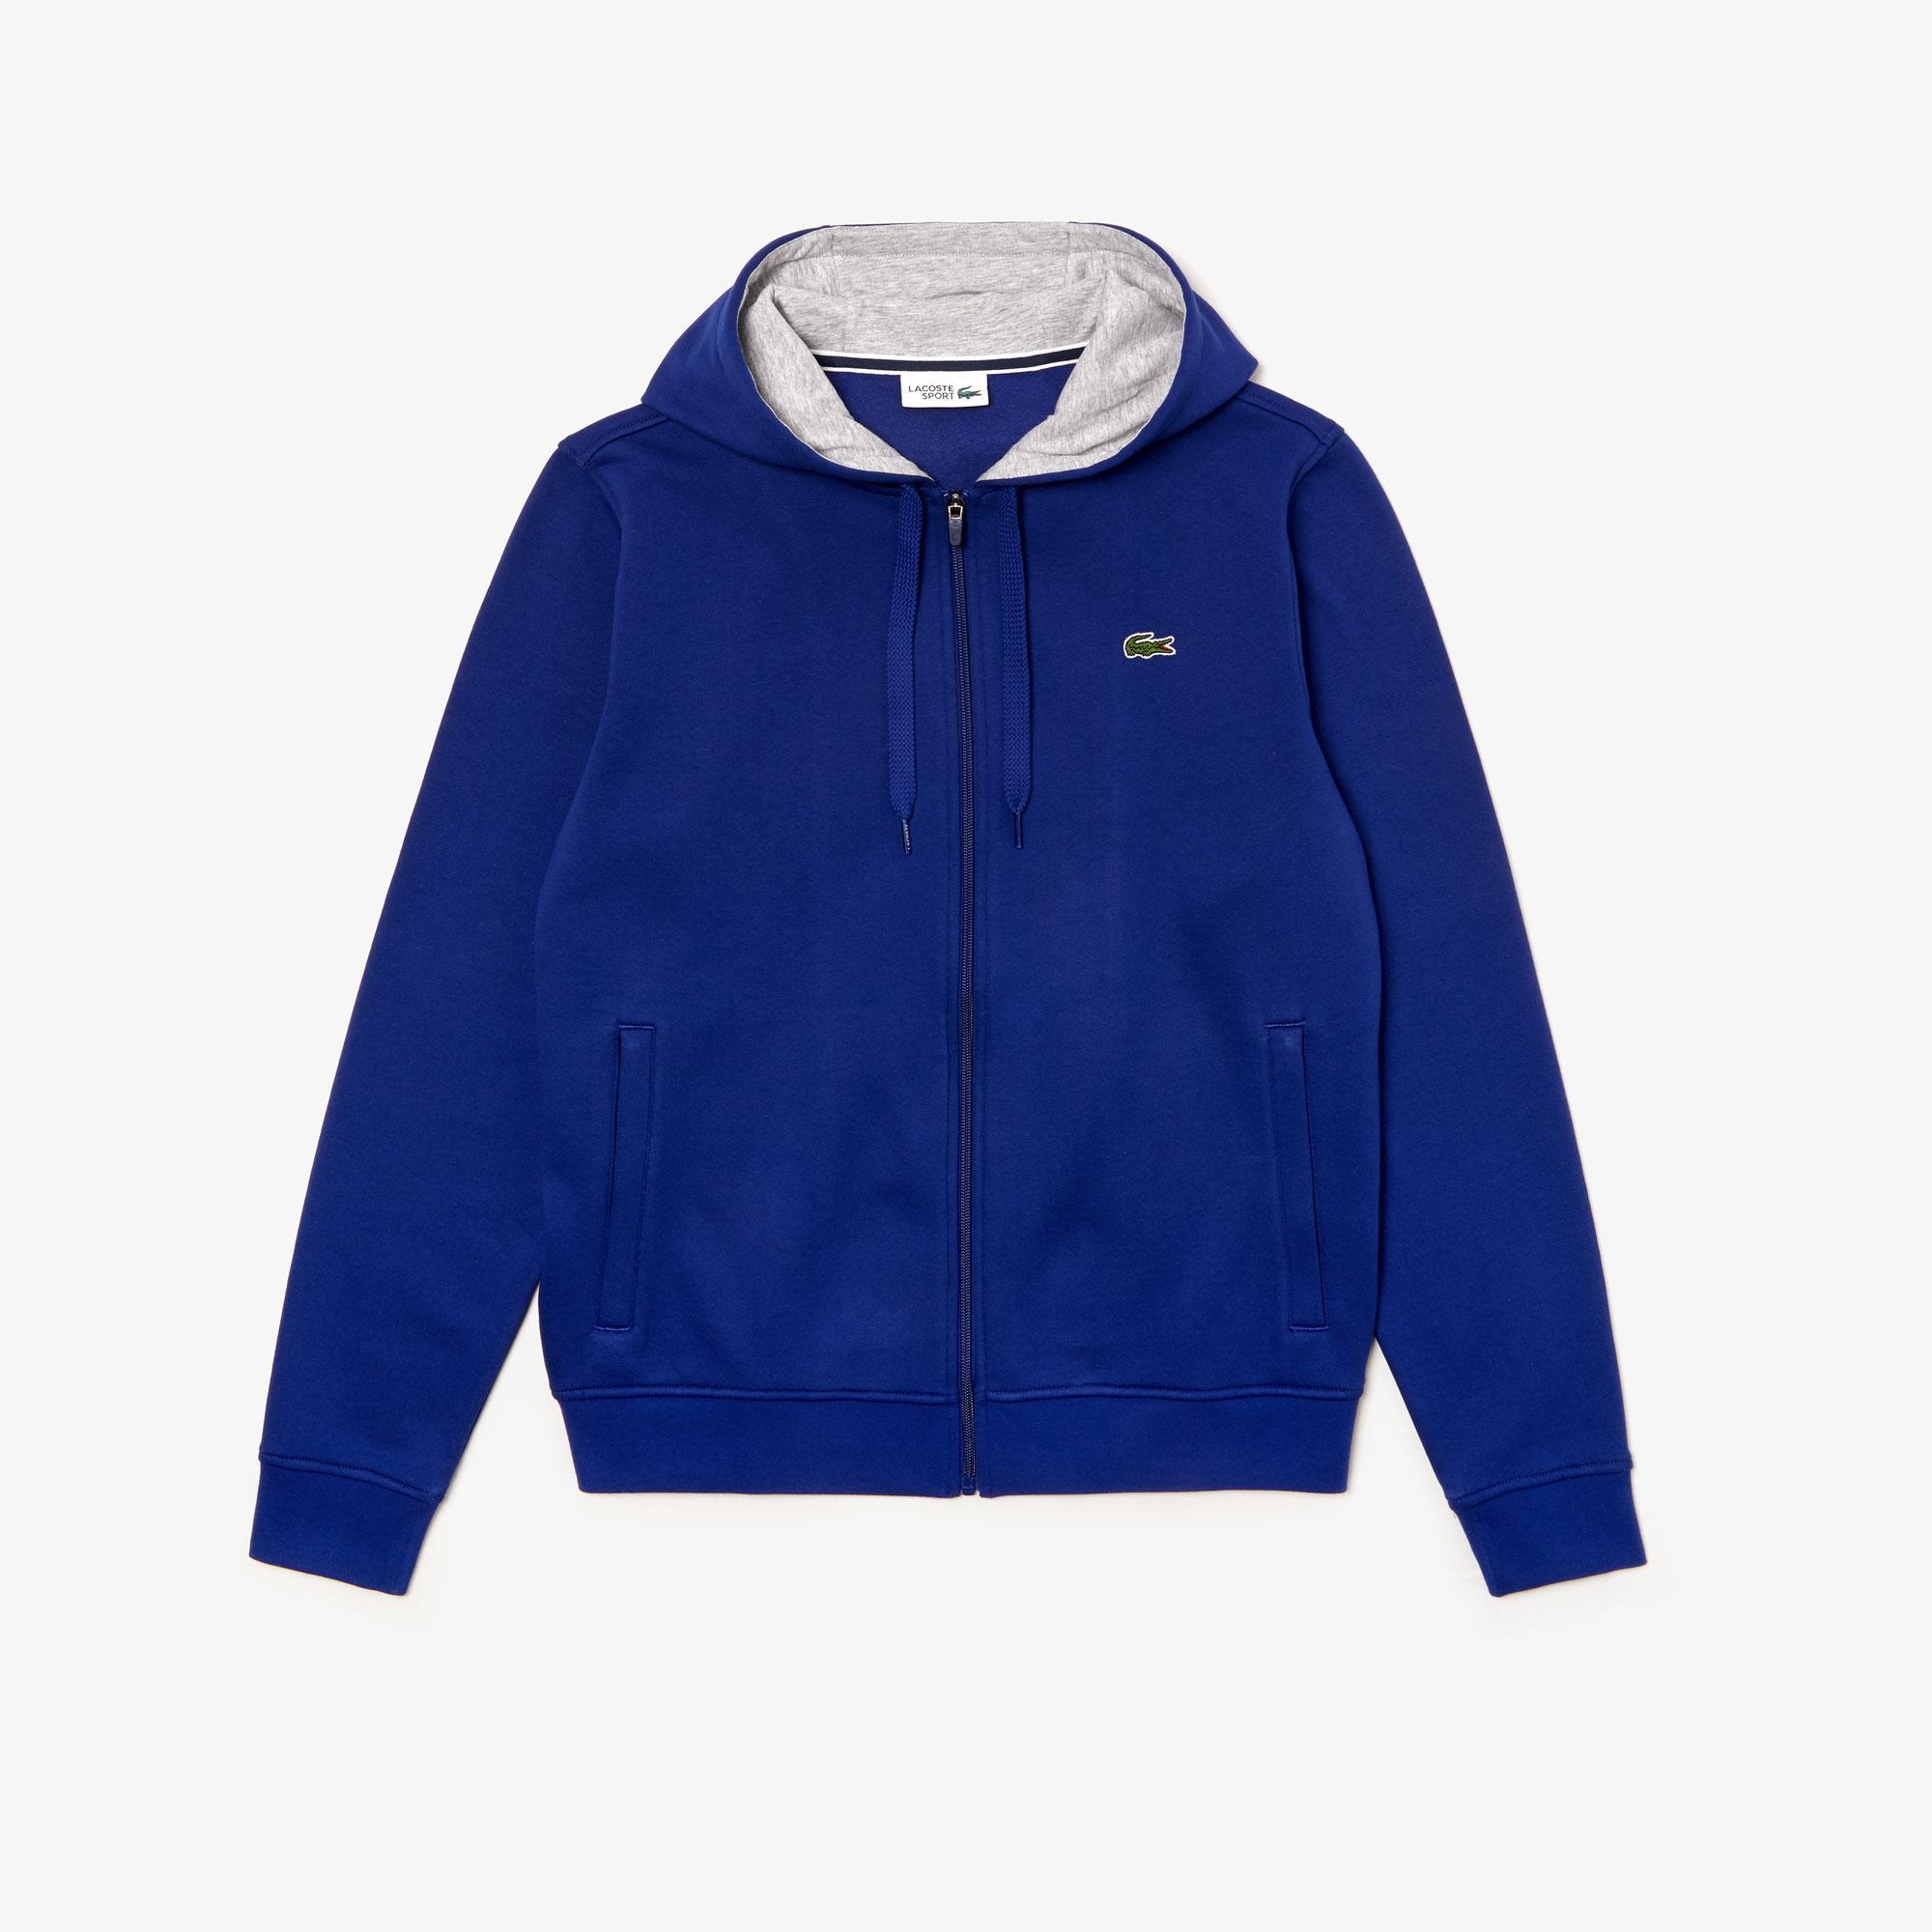 Lacoste Sport Men's Tennis Hooded Zippered Sweatshirt in Fleece